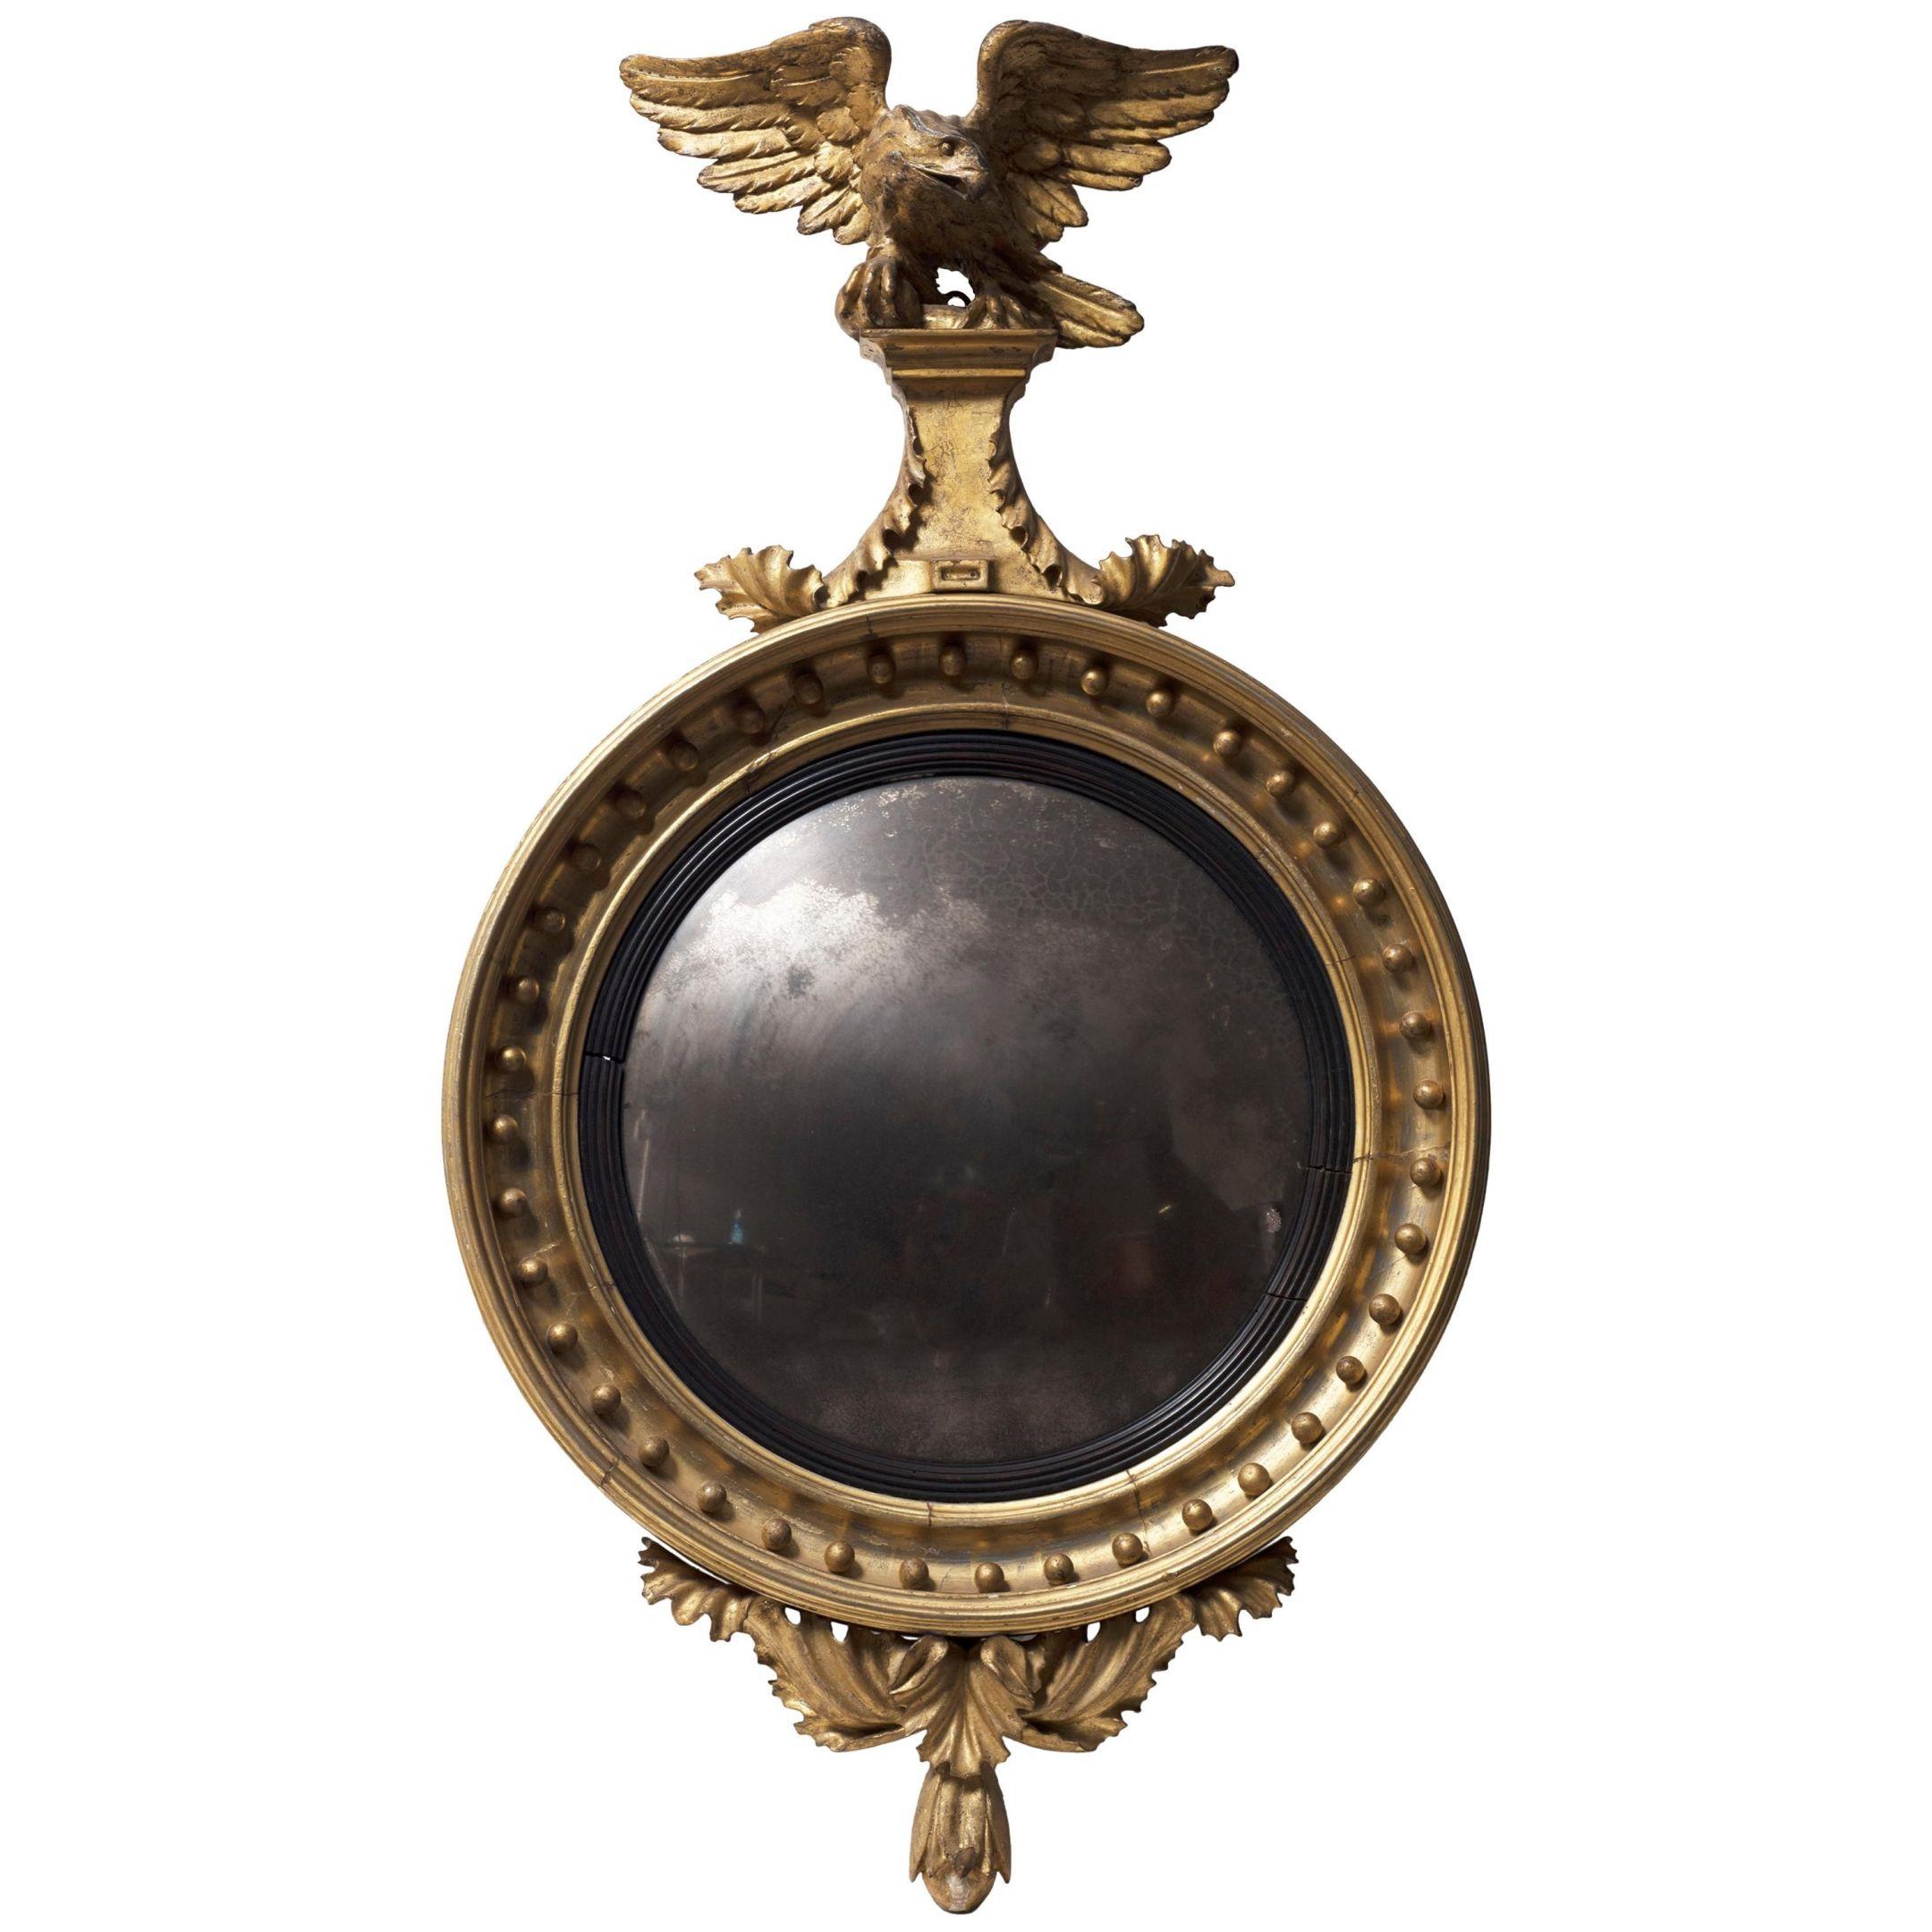 ancient_mirror.thumb.jpg.cb46a8c090bbbe5451fc736e17e4f9ab.jpg